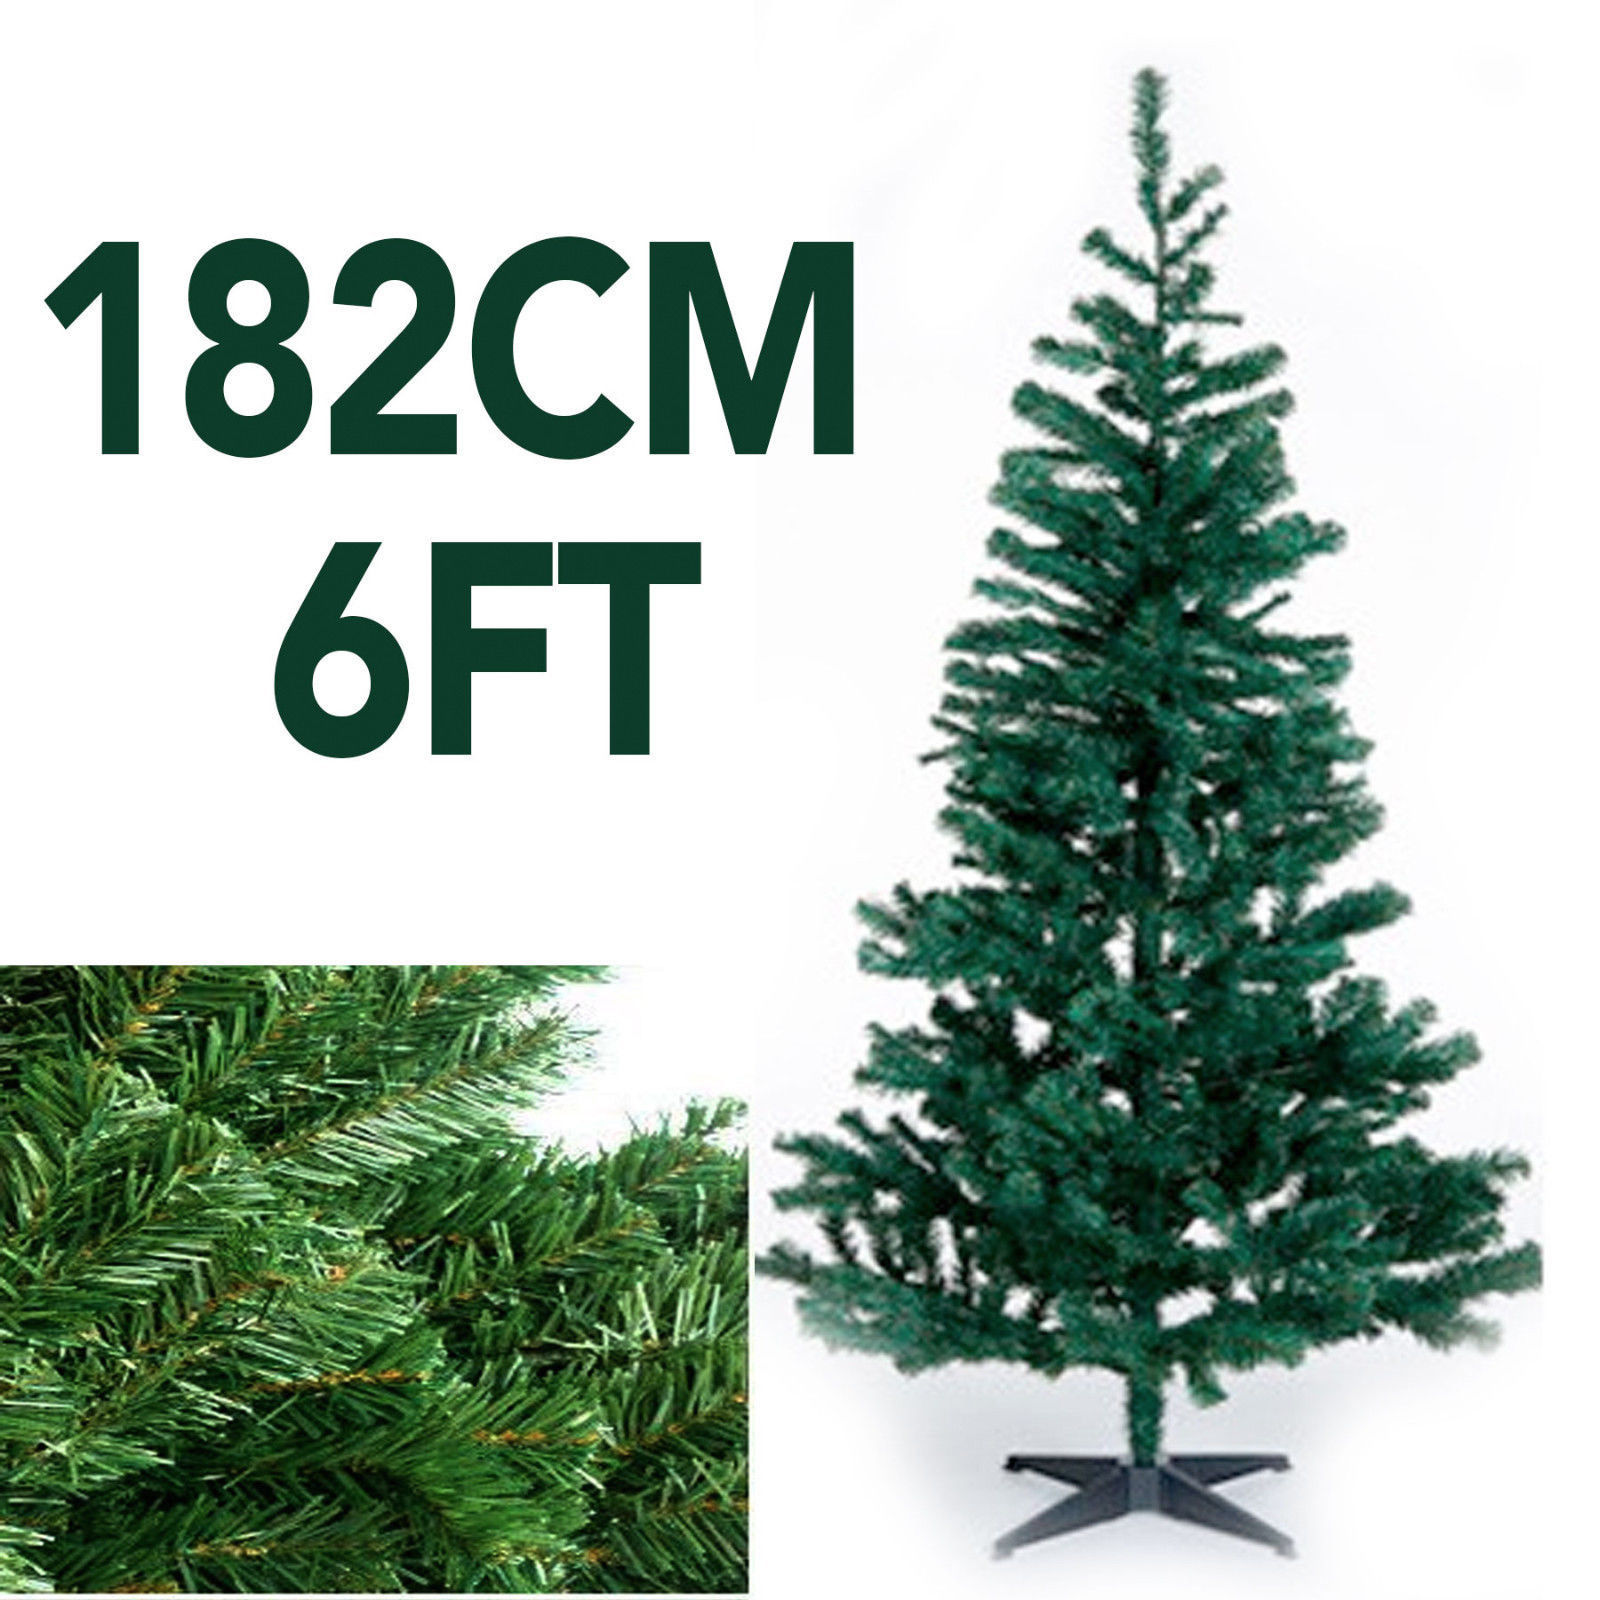 Green Artificial XMAS Christmas Tree 182CM for £6.99